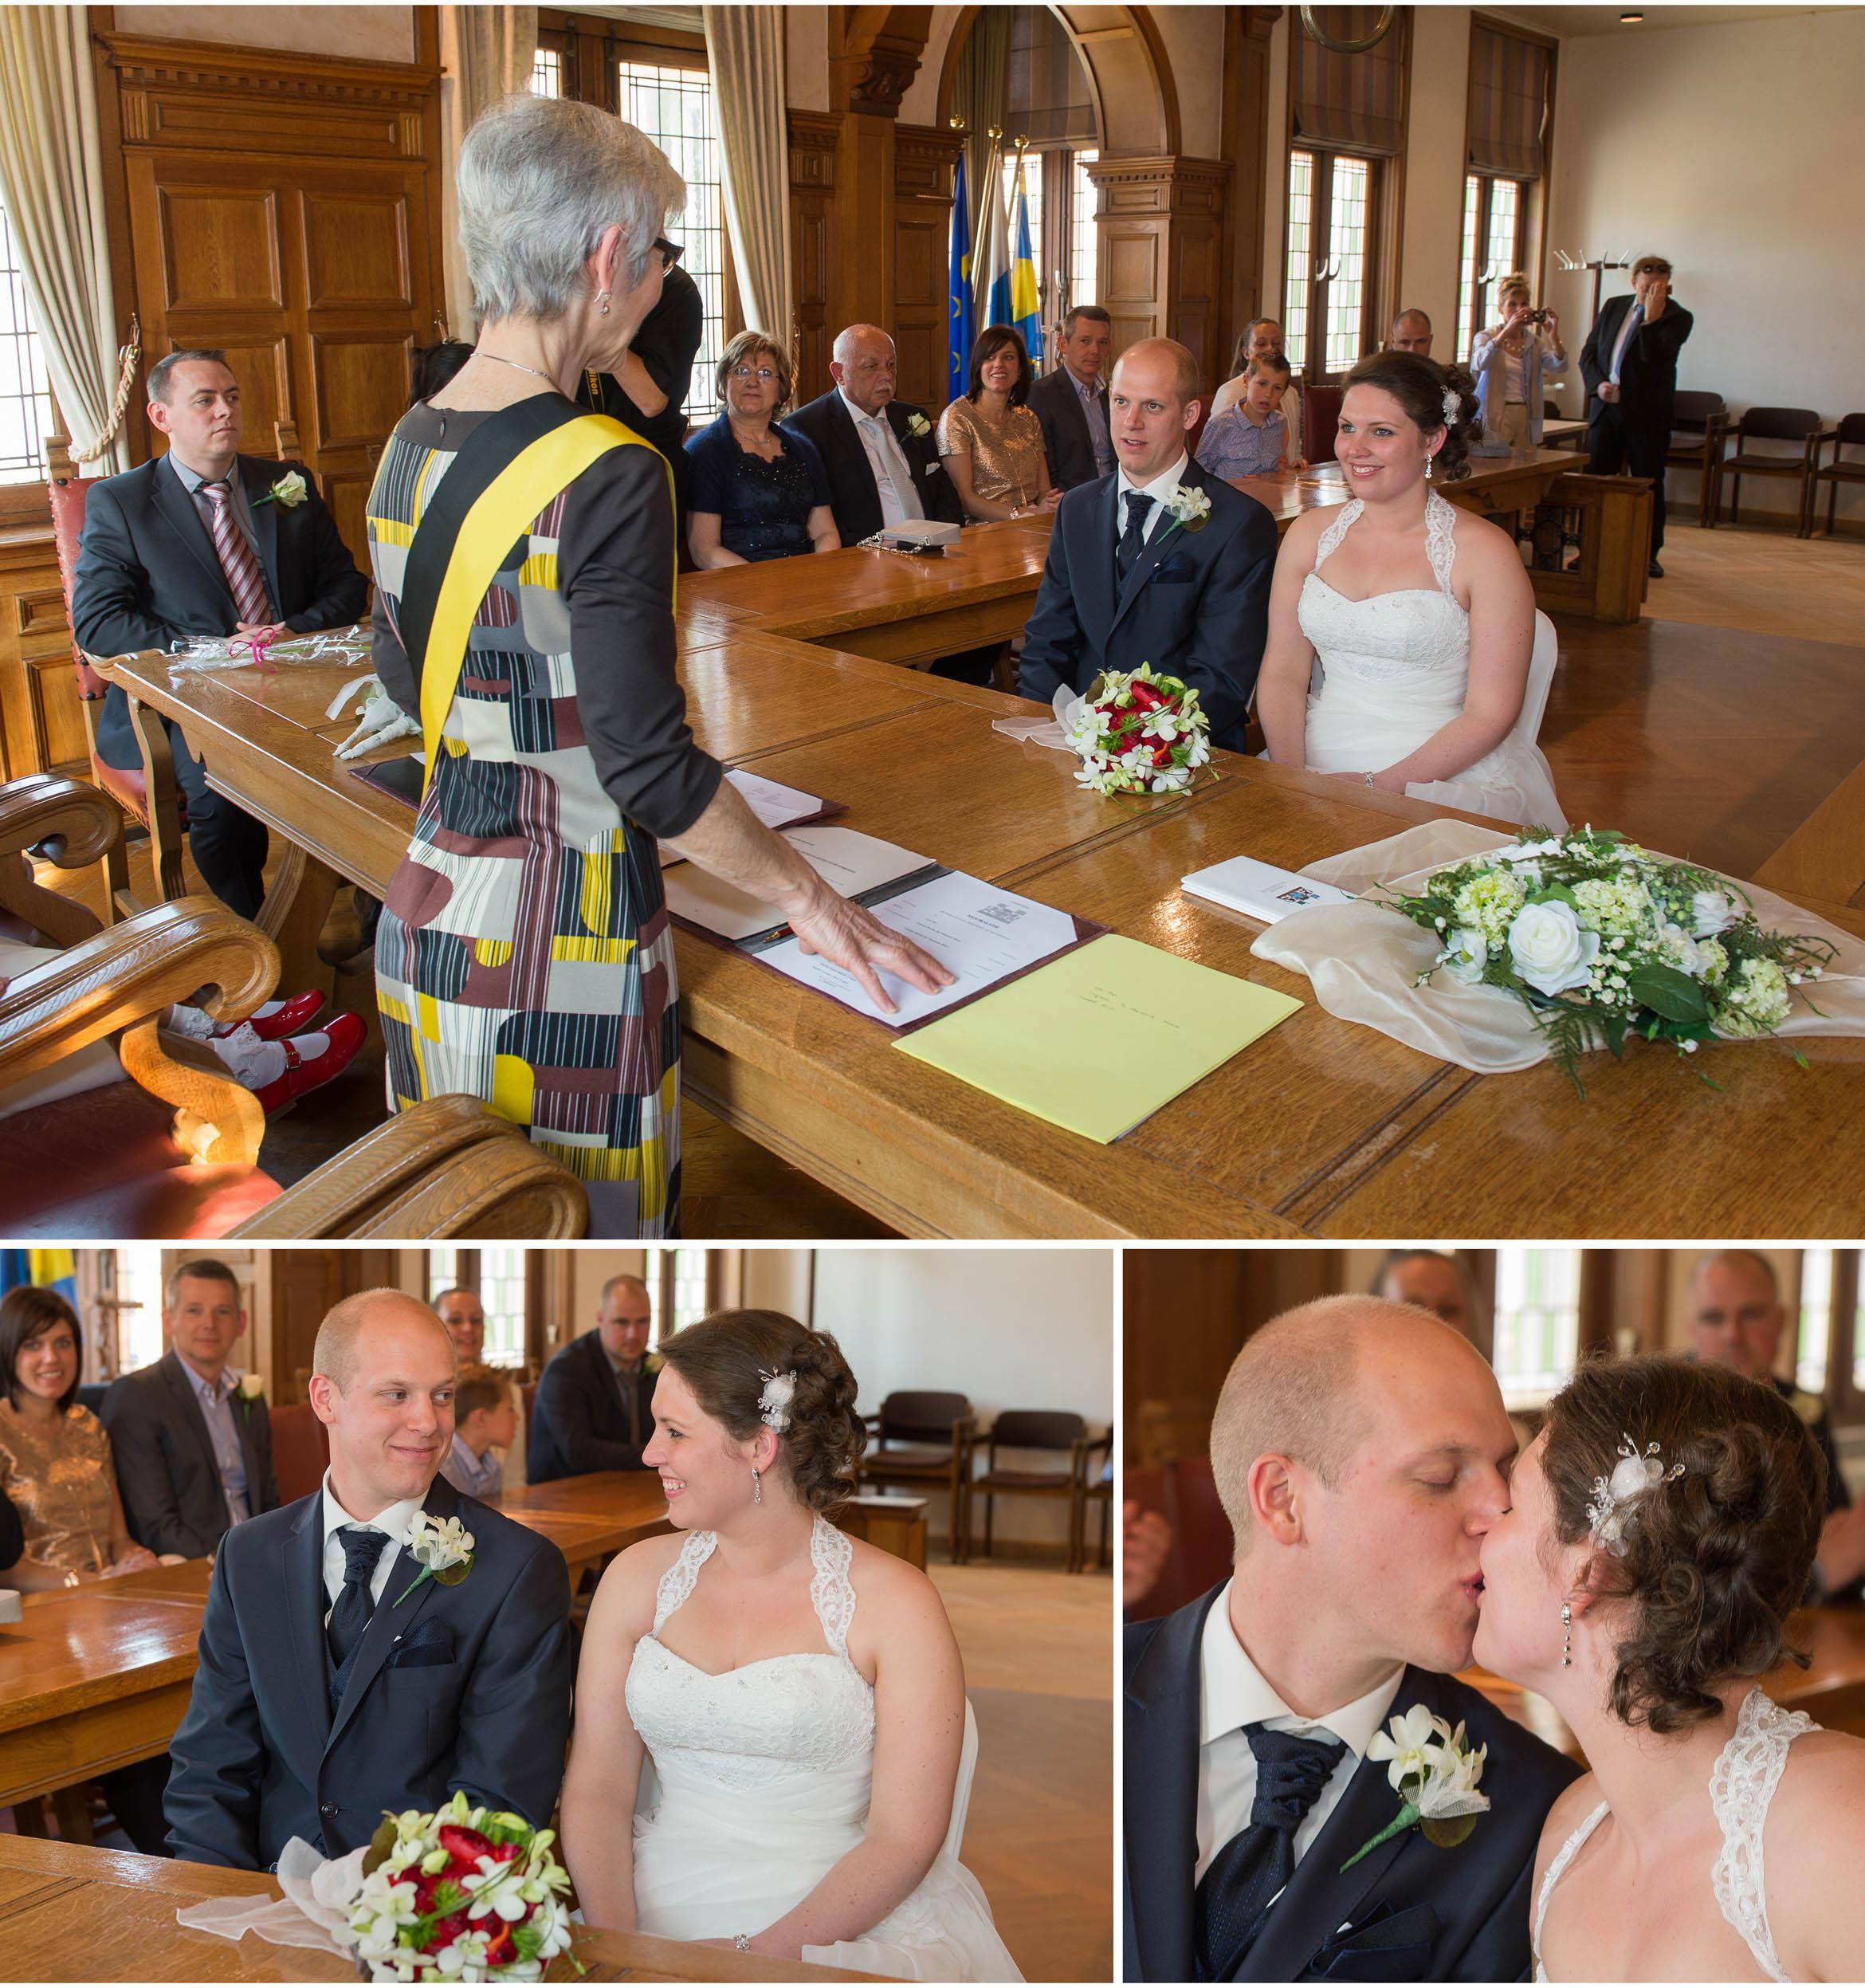 huwelijksfotograaf Sint-martens-Latem